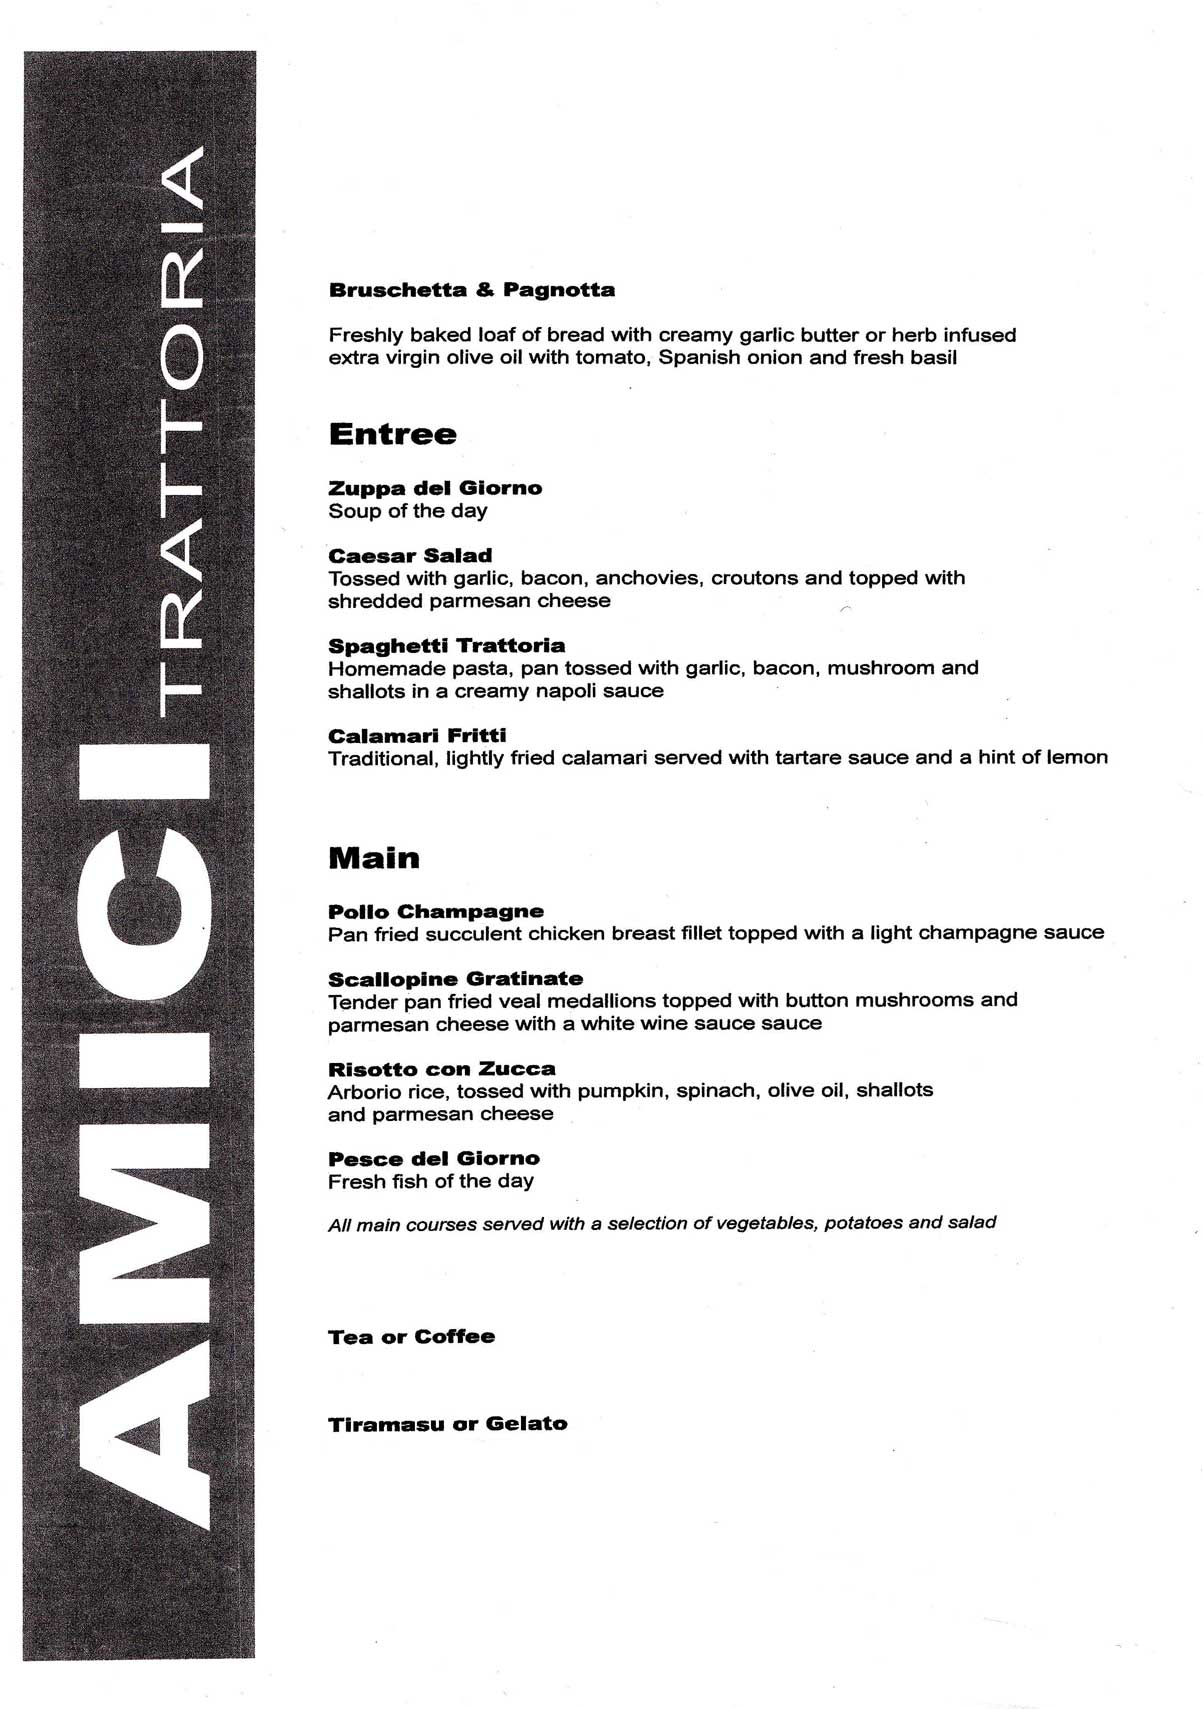 Amici Trattoria menu for the night